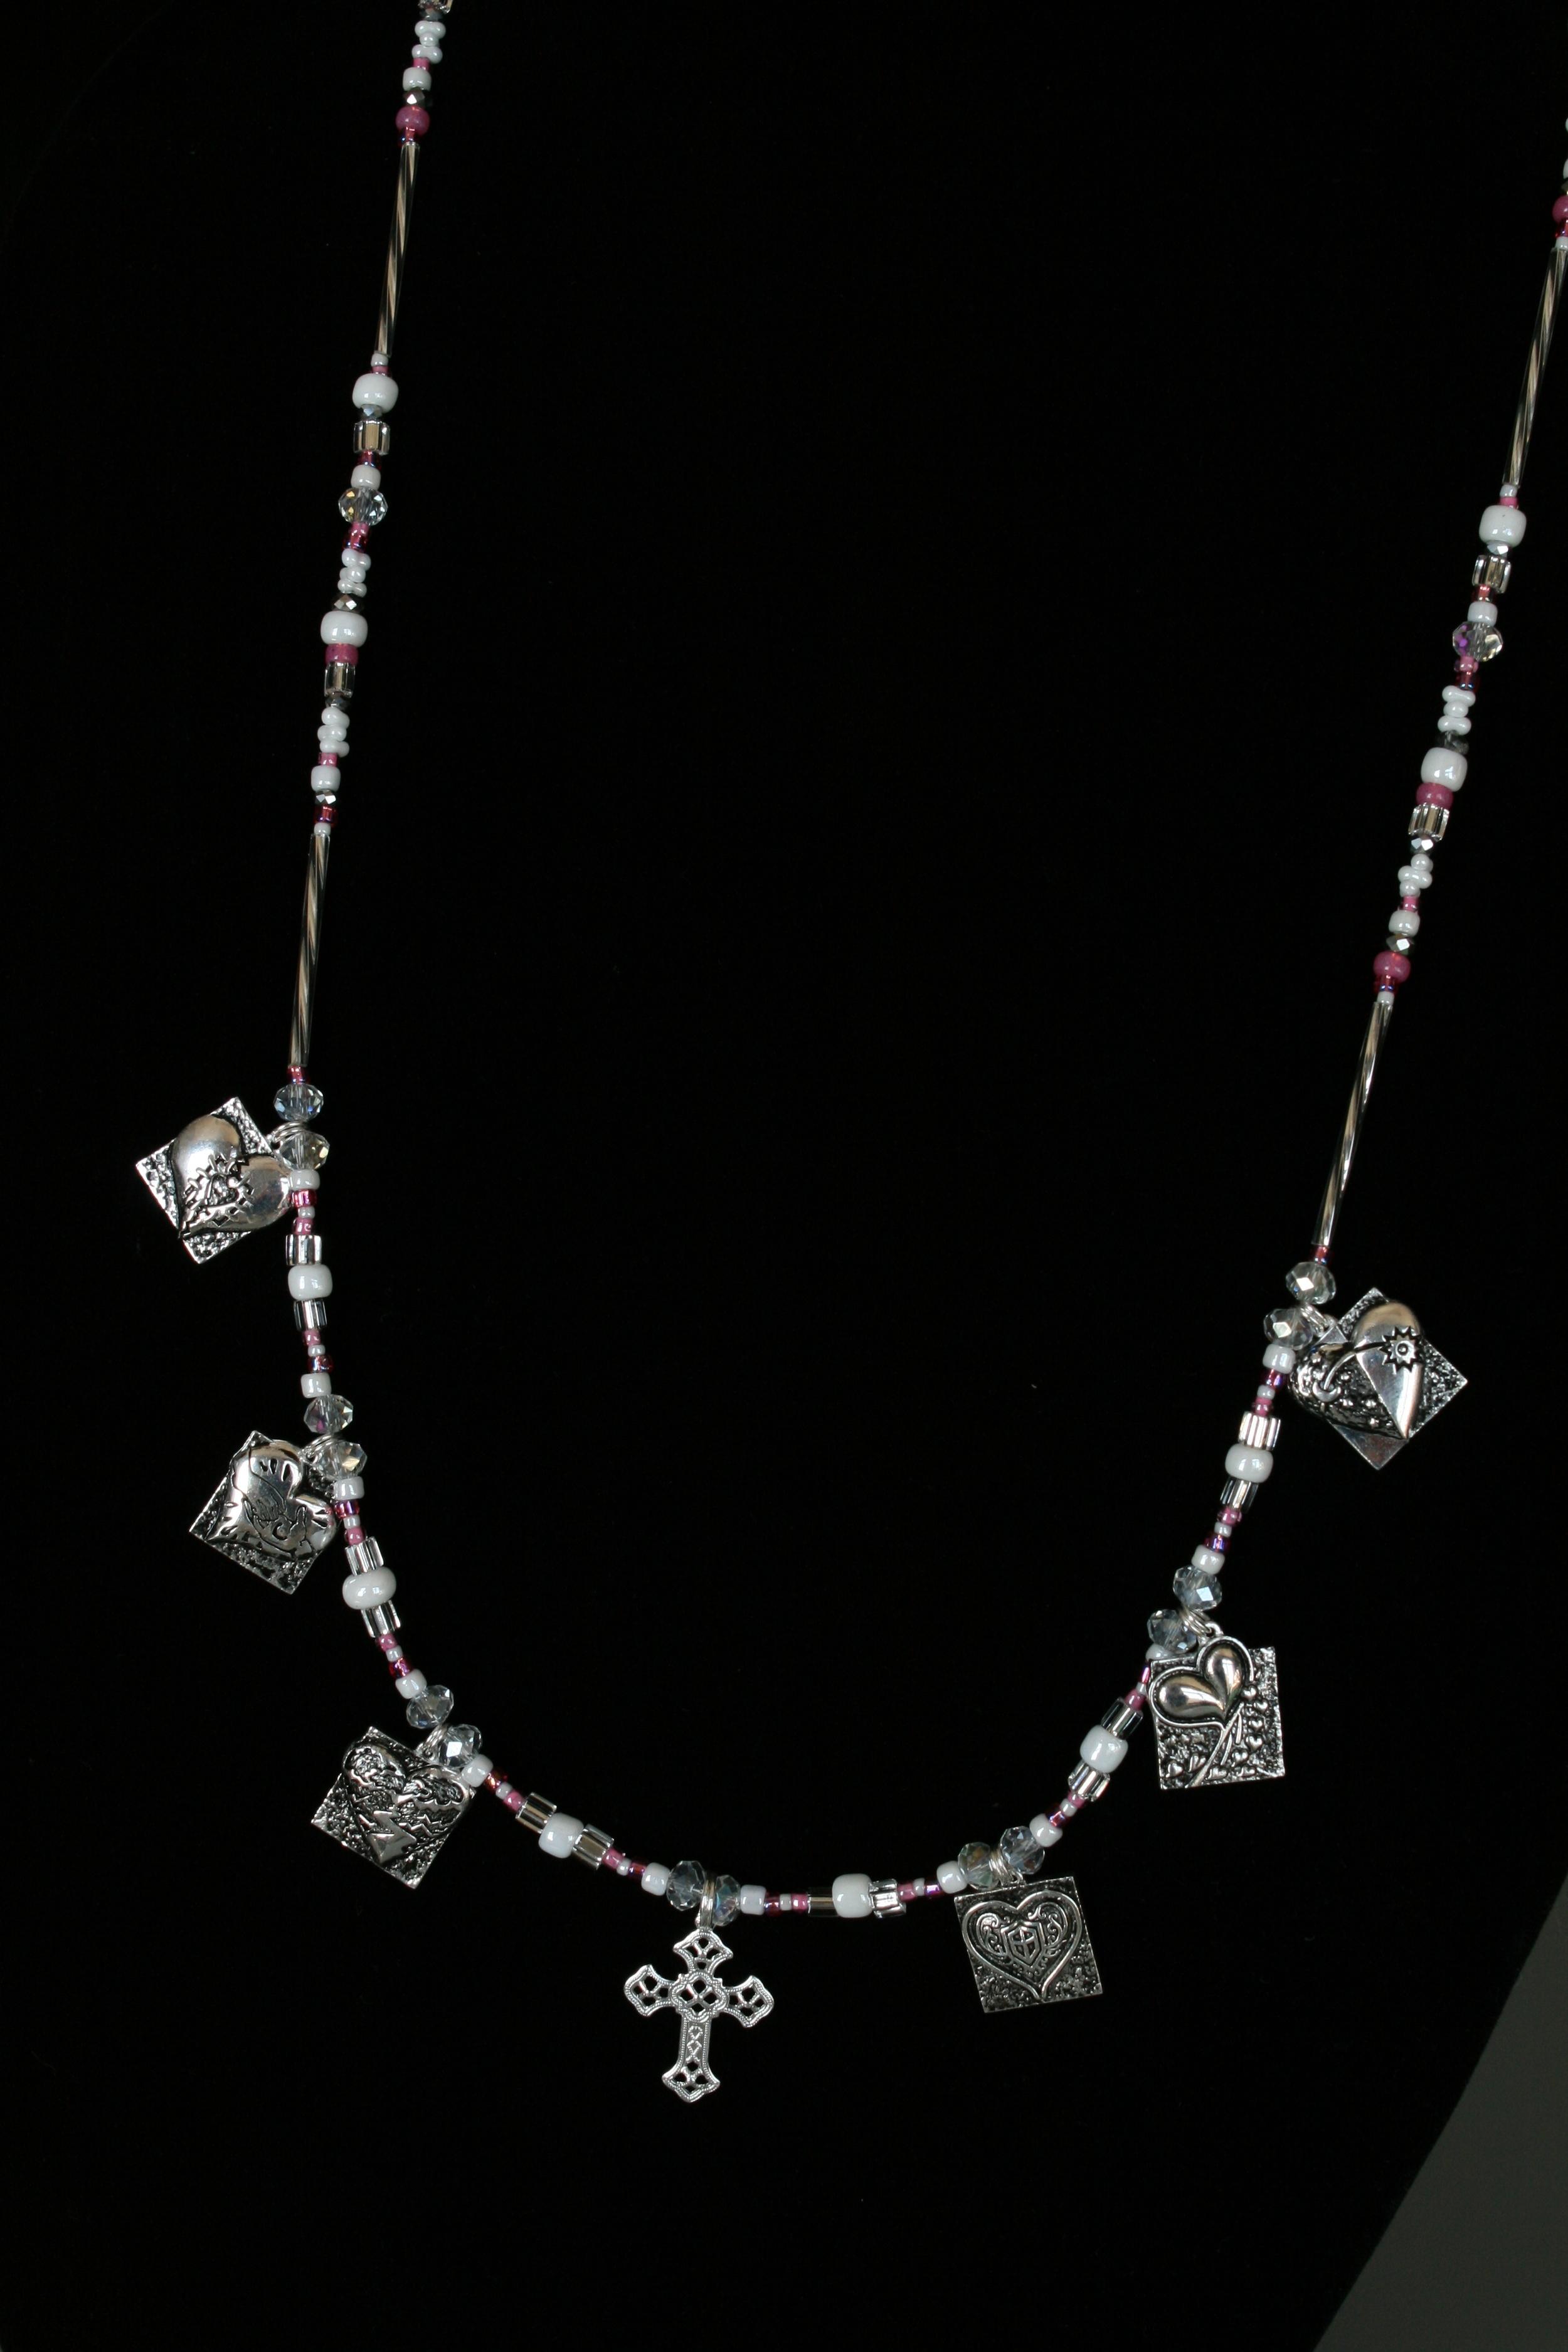 2015 AWL Necklace.JPG